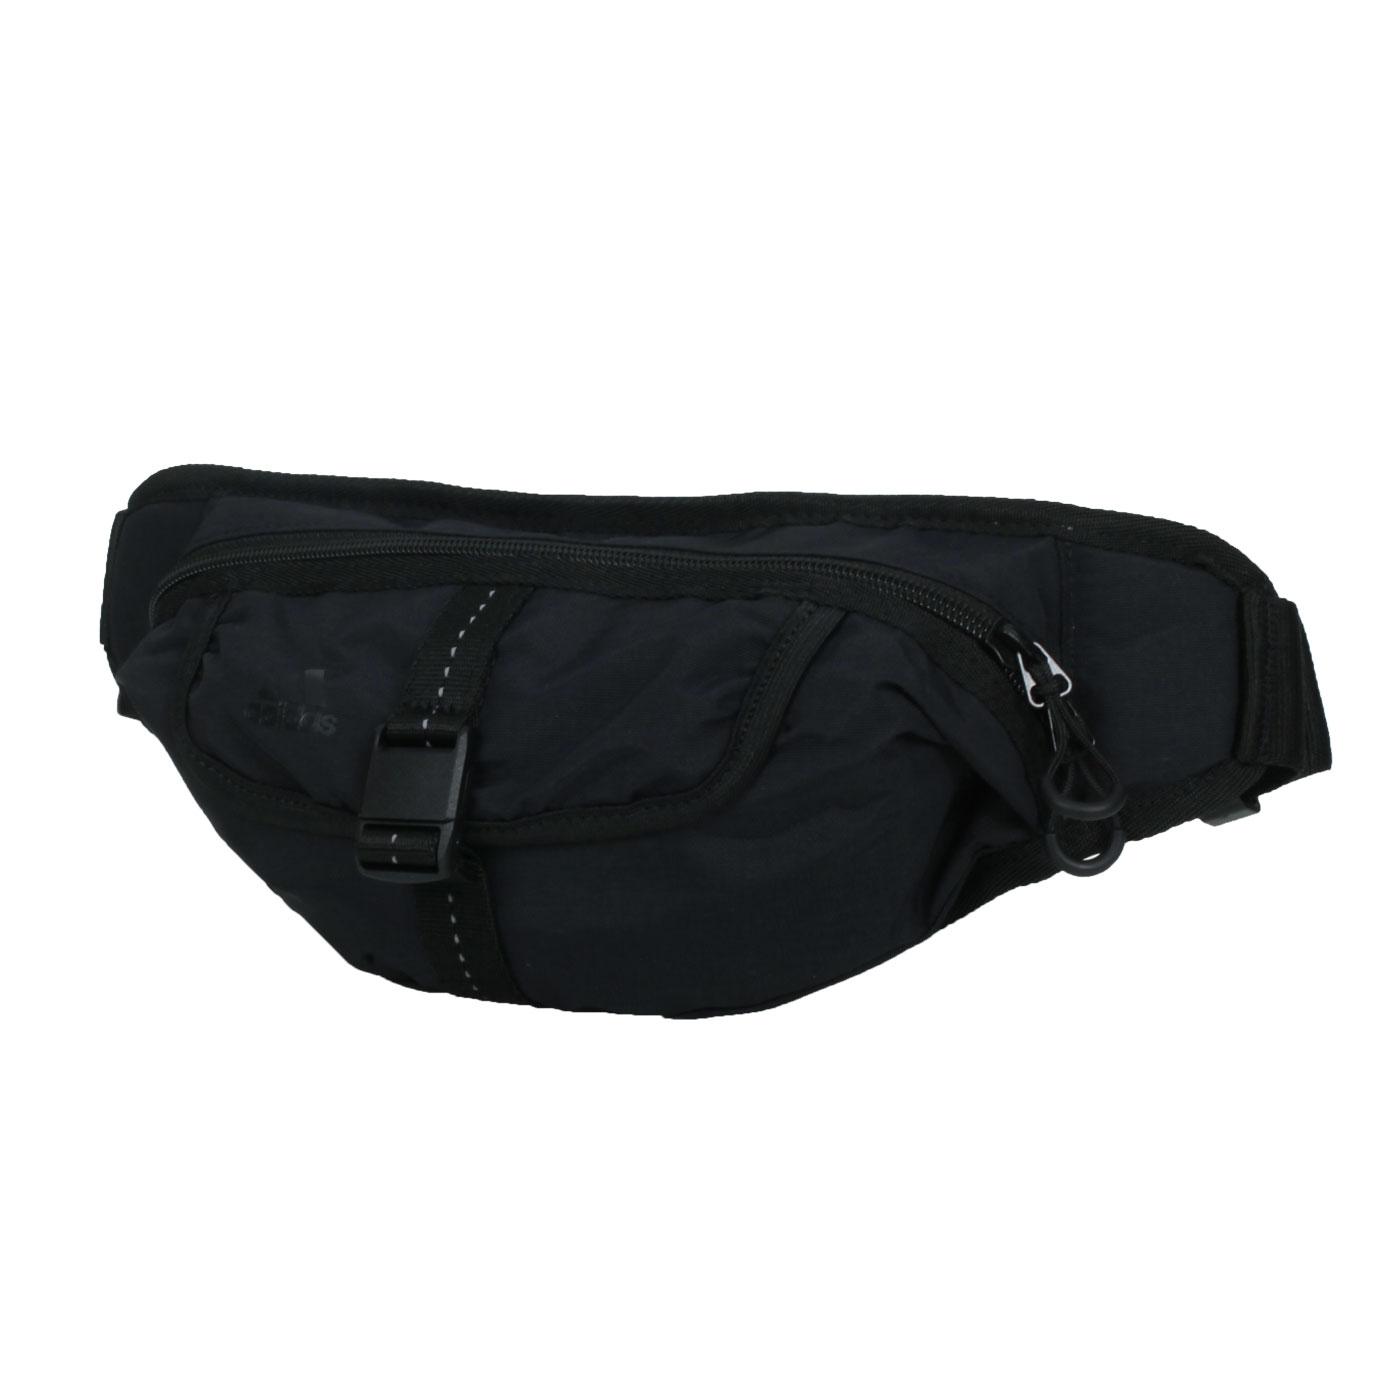 ADIDAS 腰包 GL8622 - 黑